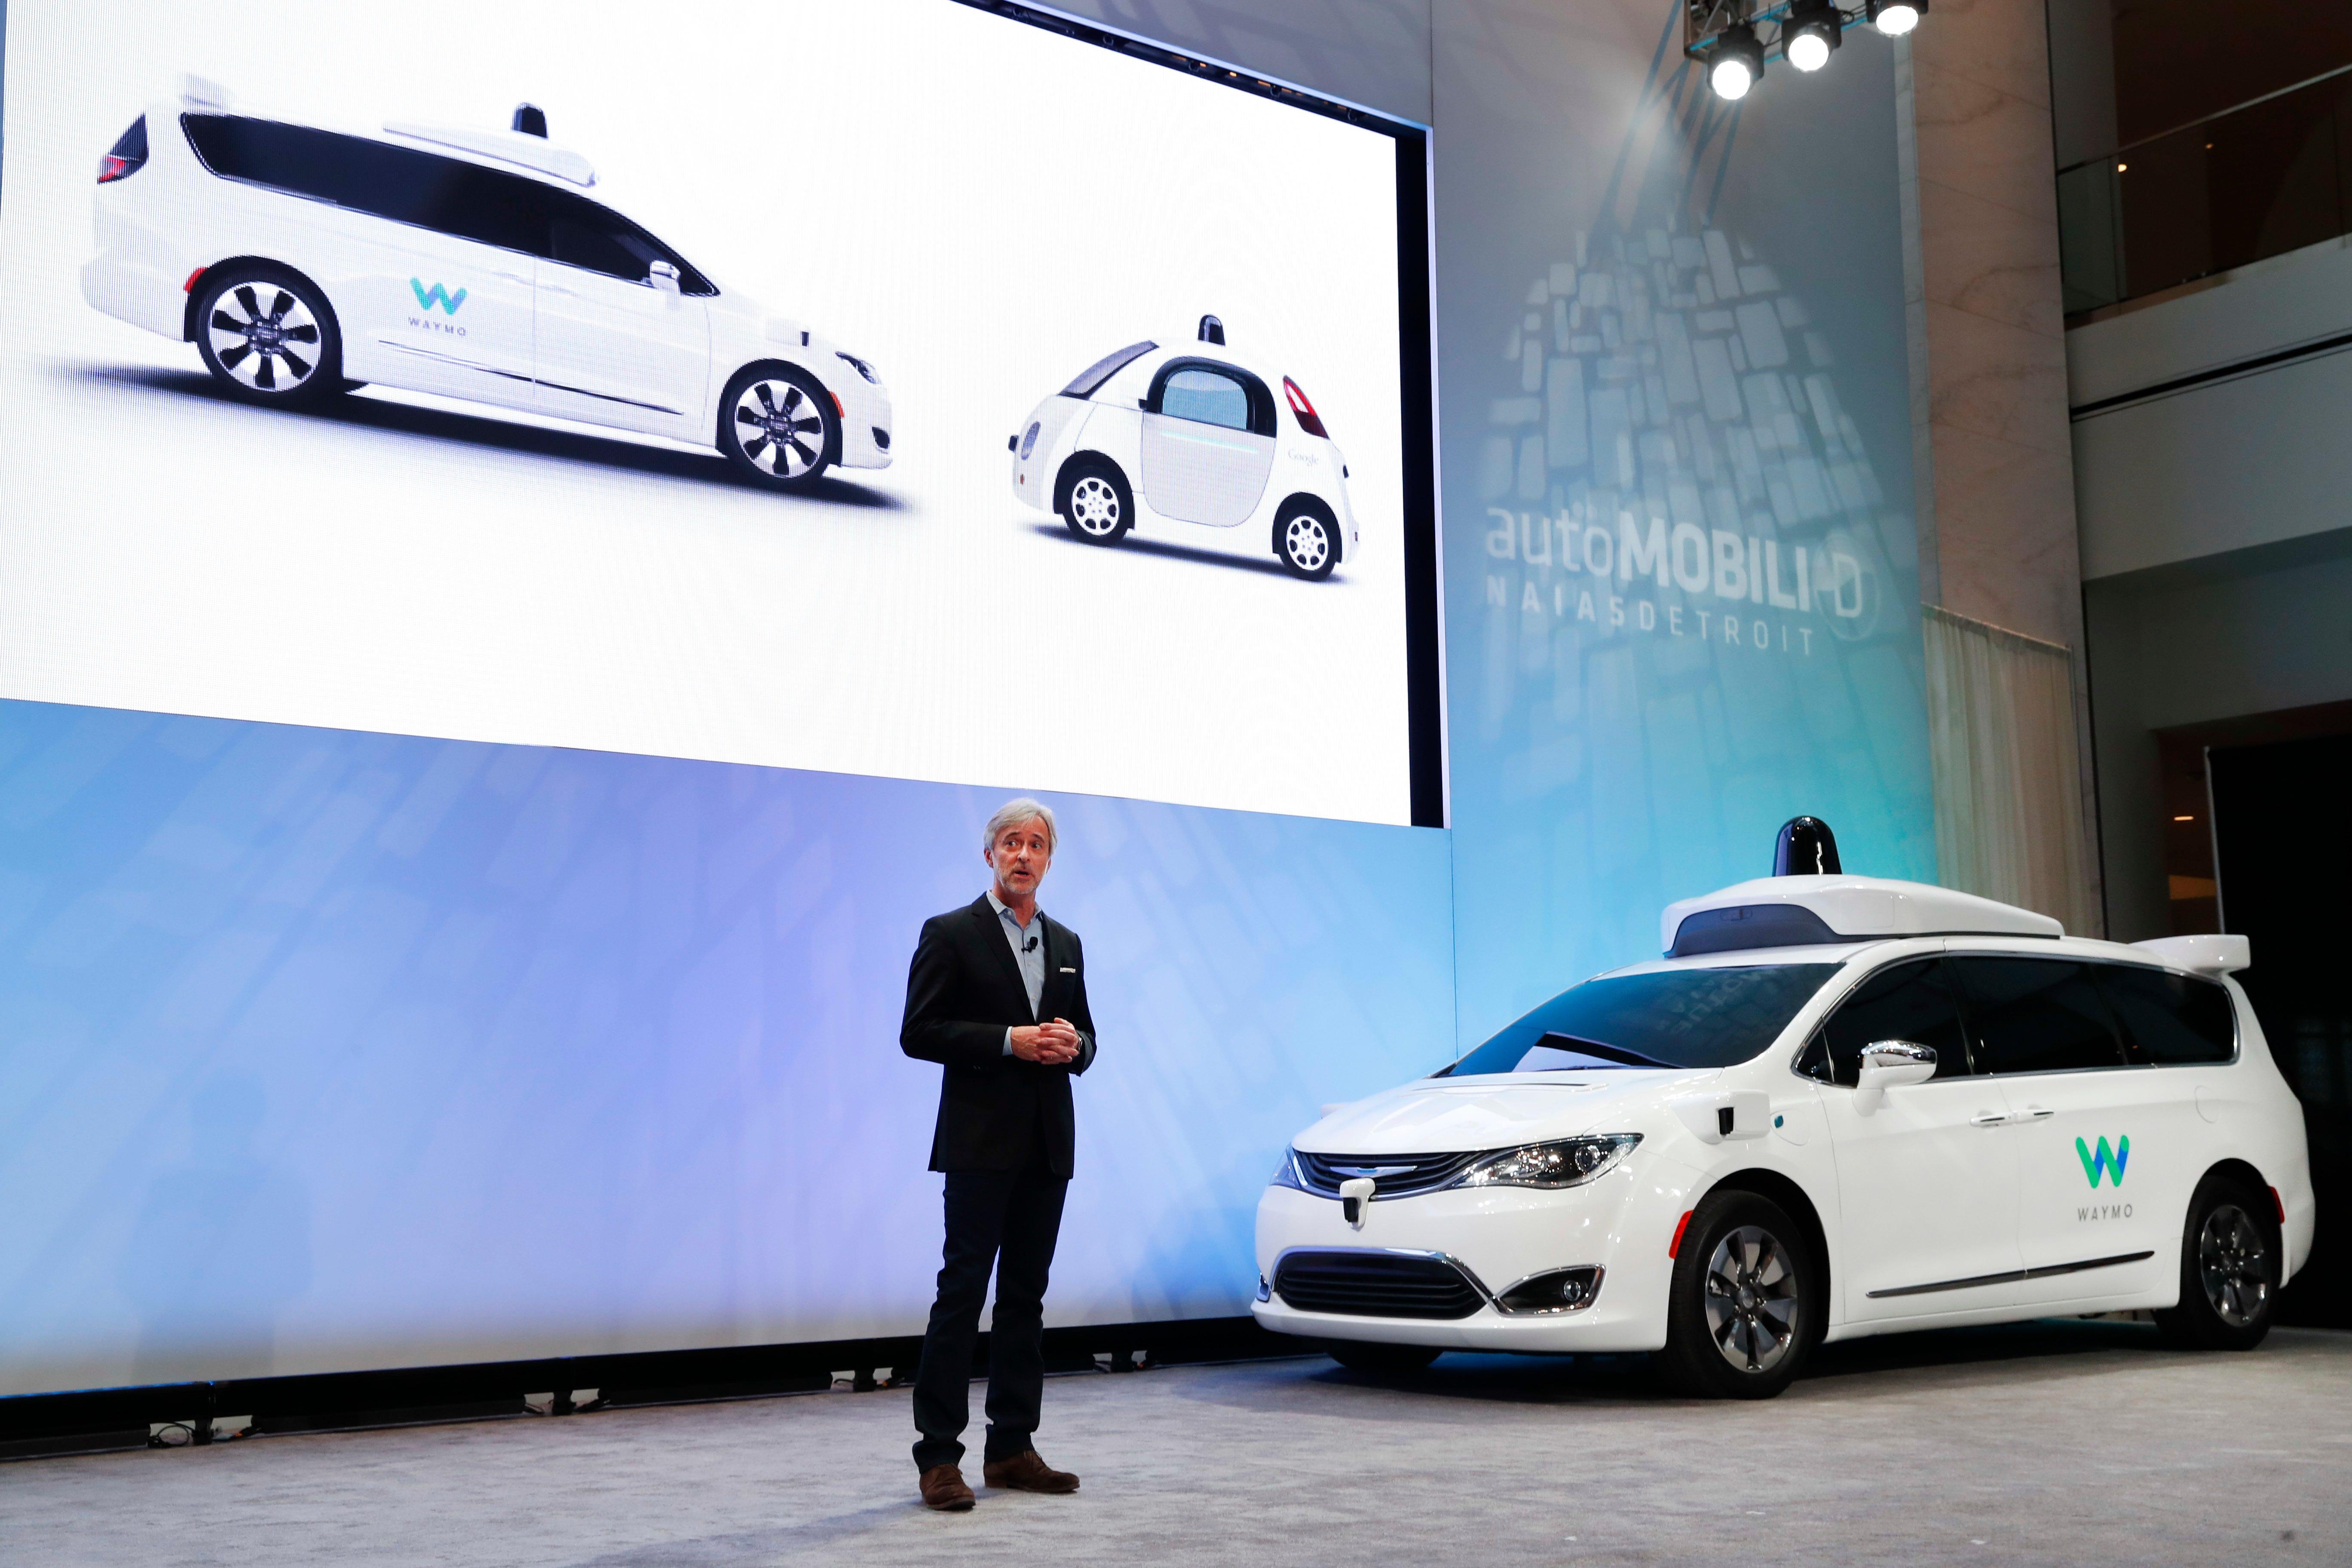 Uber slams Waymo suit as 'baseless'